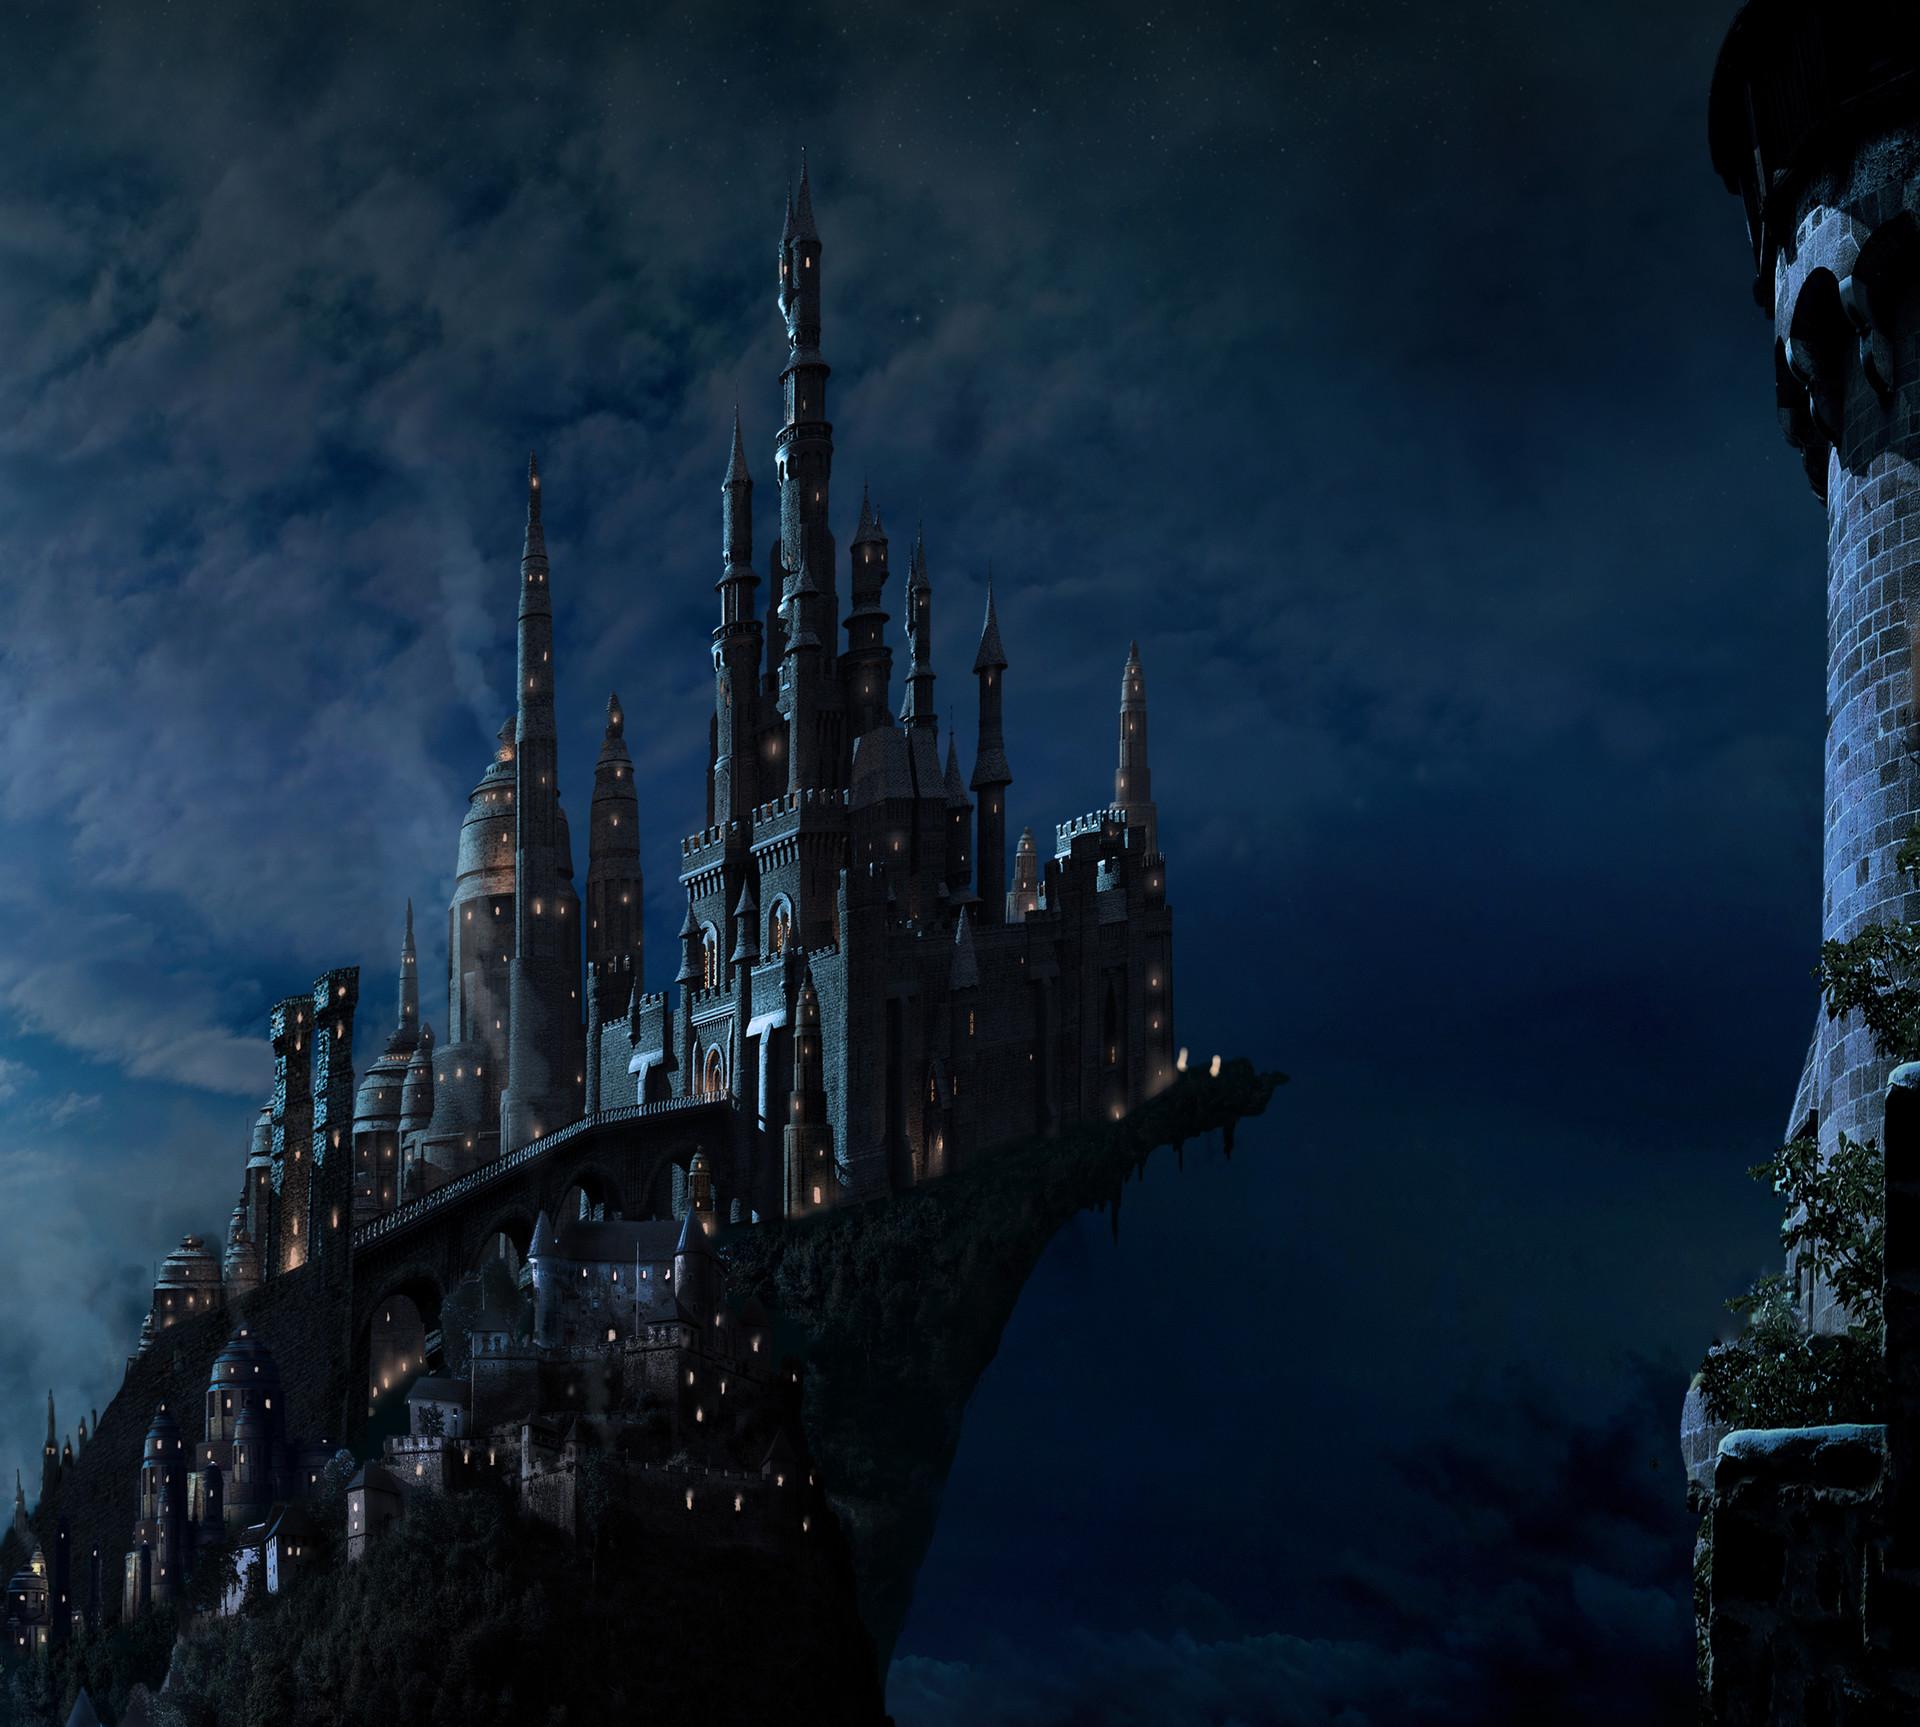 Scott richard moonlight fantasy by scott richard updated v4 ss detail